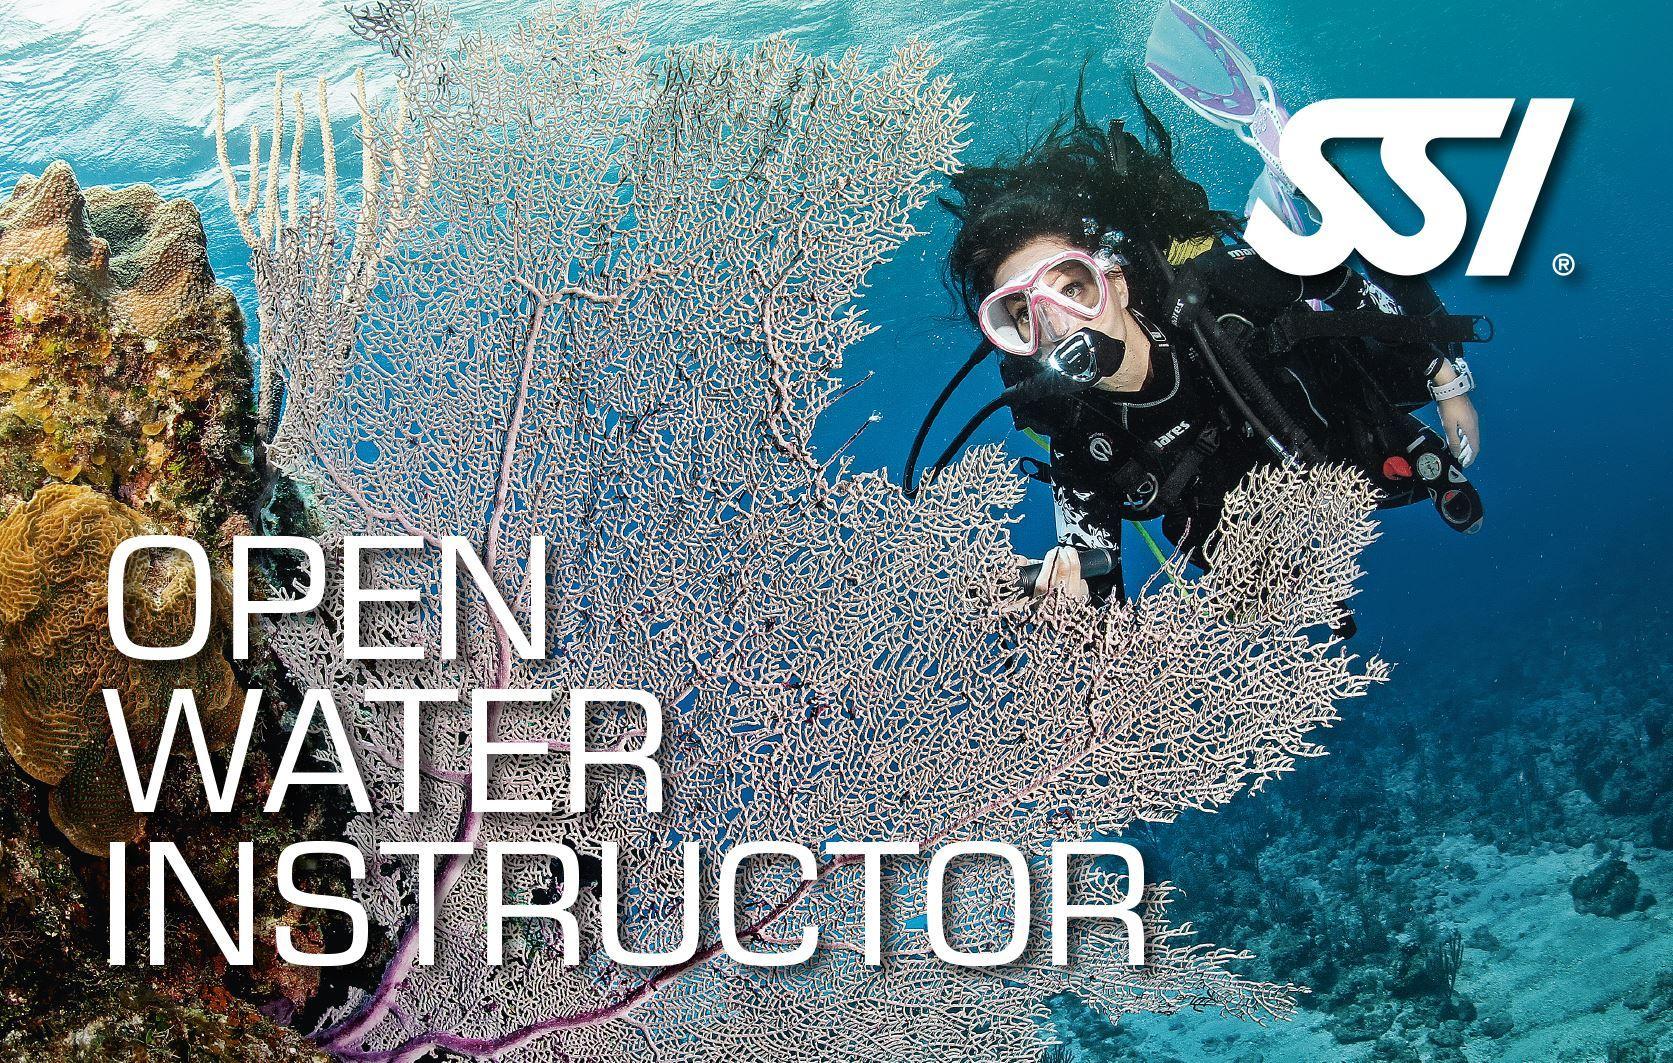 SSI Instruktør kursus - eksl. materialer thumbnail